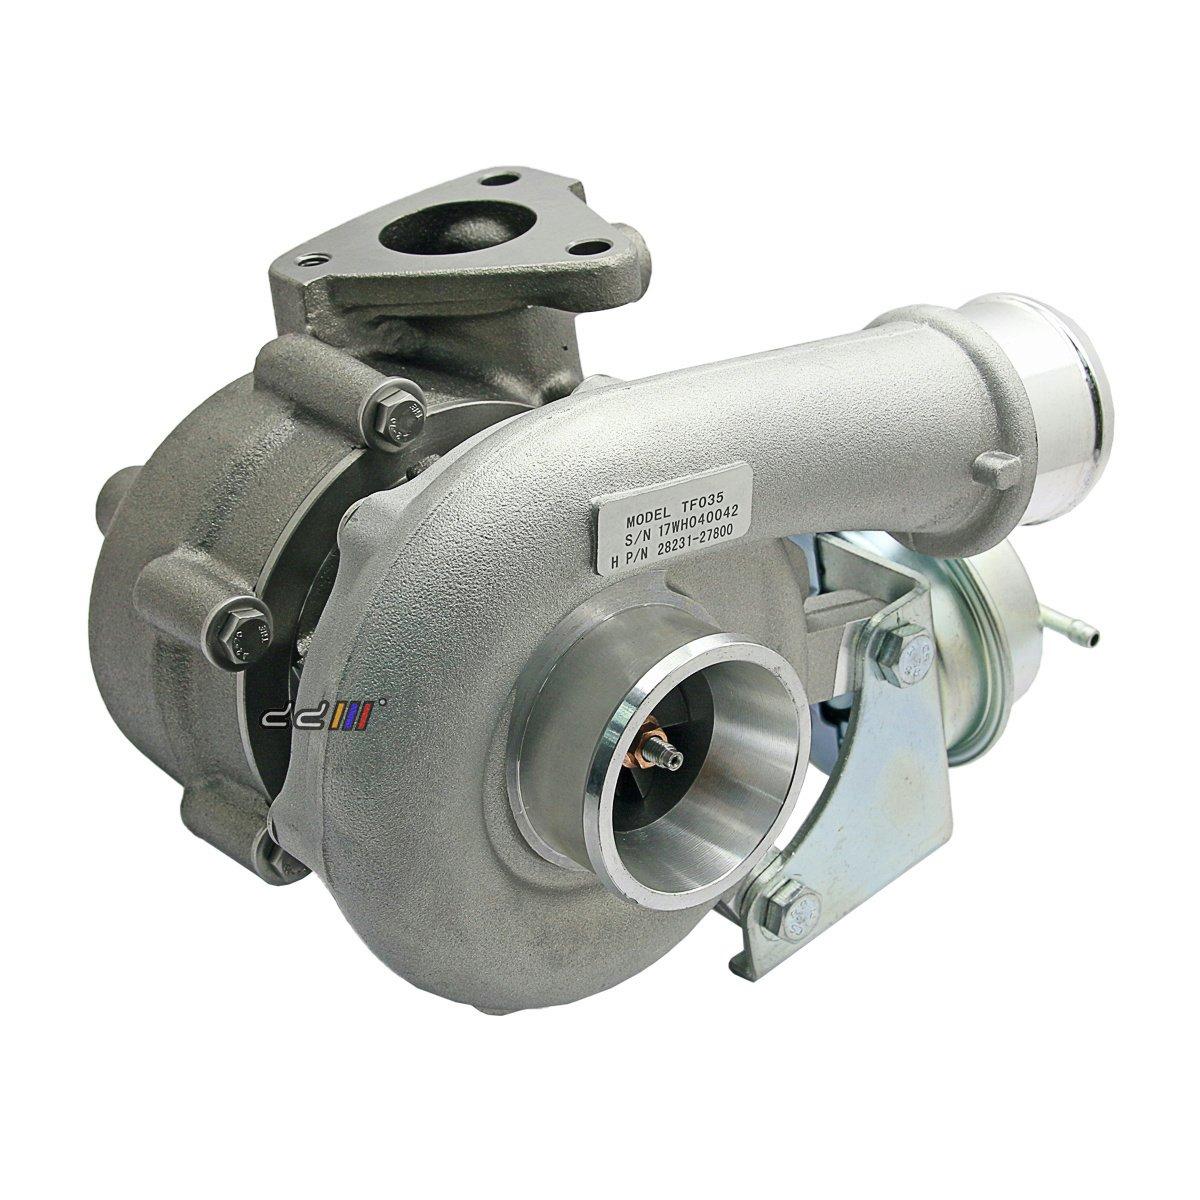 Turbo Turbocharger For Hyundai Sante Fe 2 2l Crdi D4eb 150hp Tf035 28231 27800 Ebay